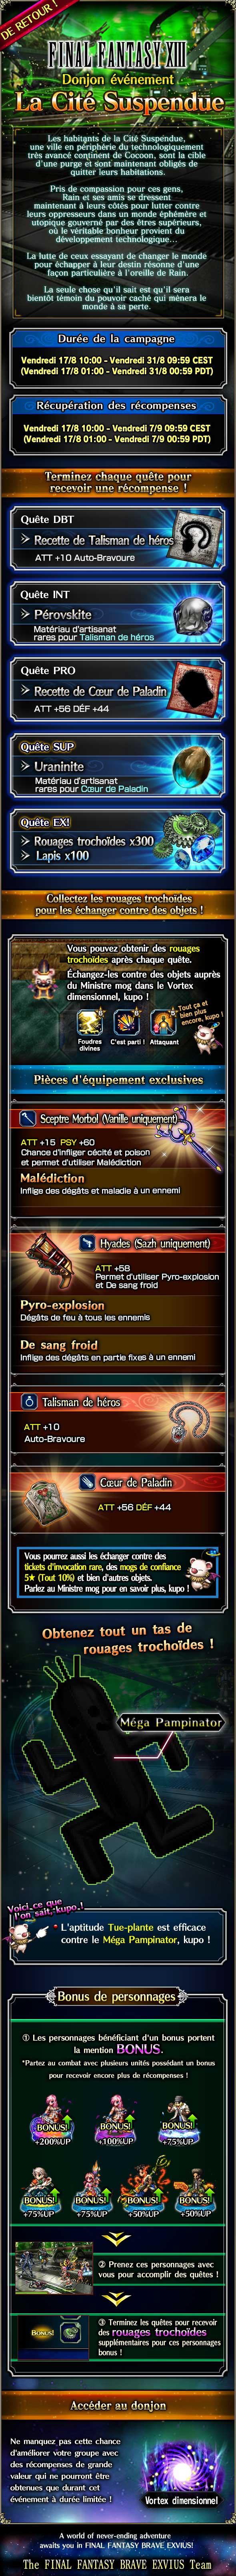 Evenement MK FFXIII (Rerun) - La Cité Supendue - du 17/08 au 31/08/18 News_banner_HangingEdge_Rerun